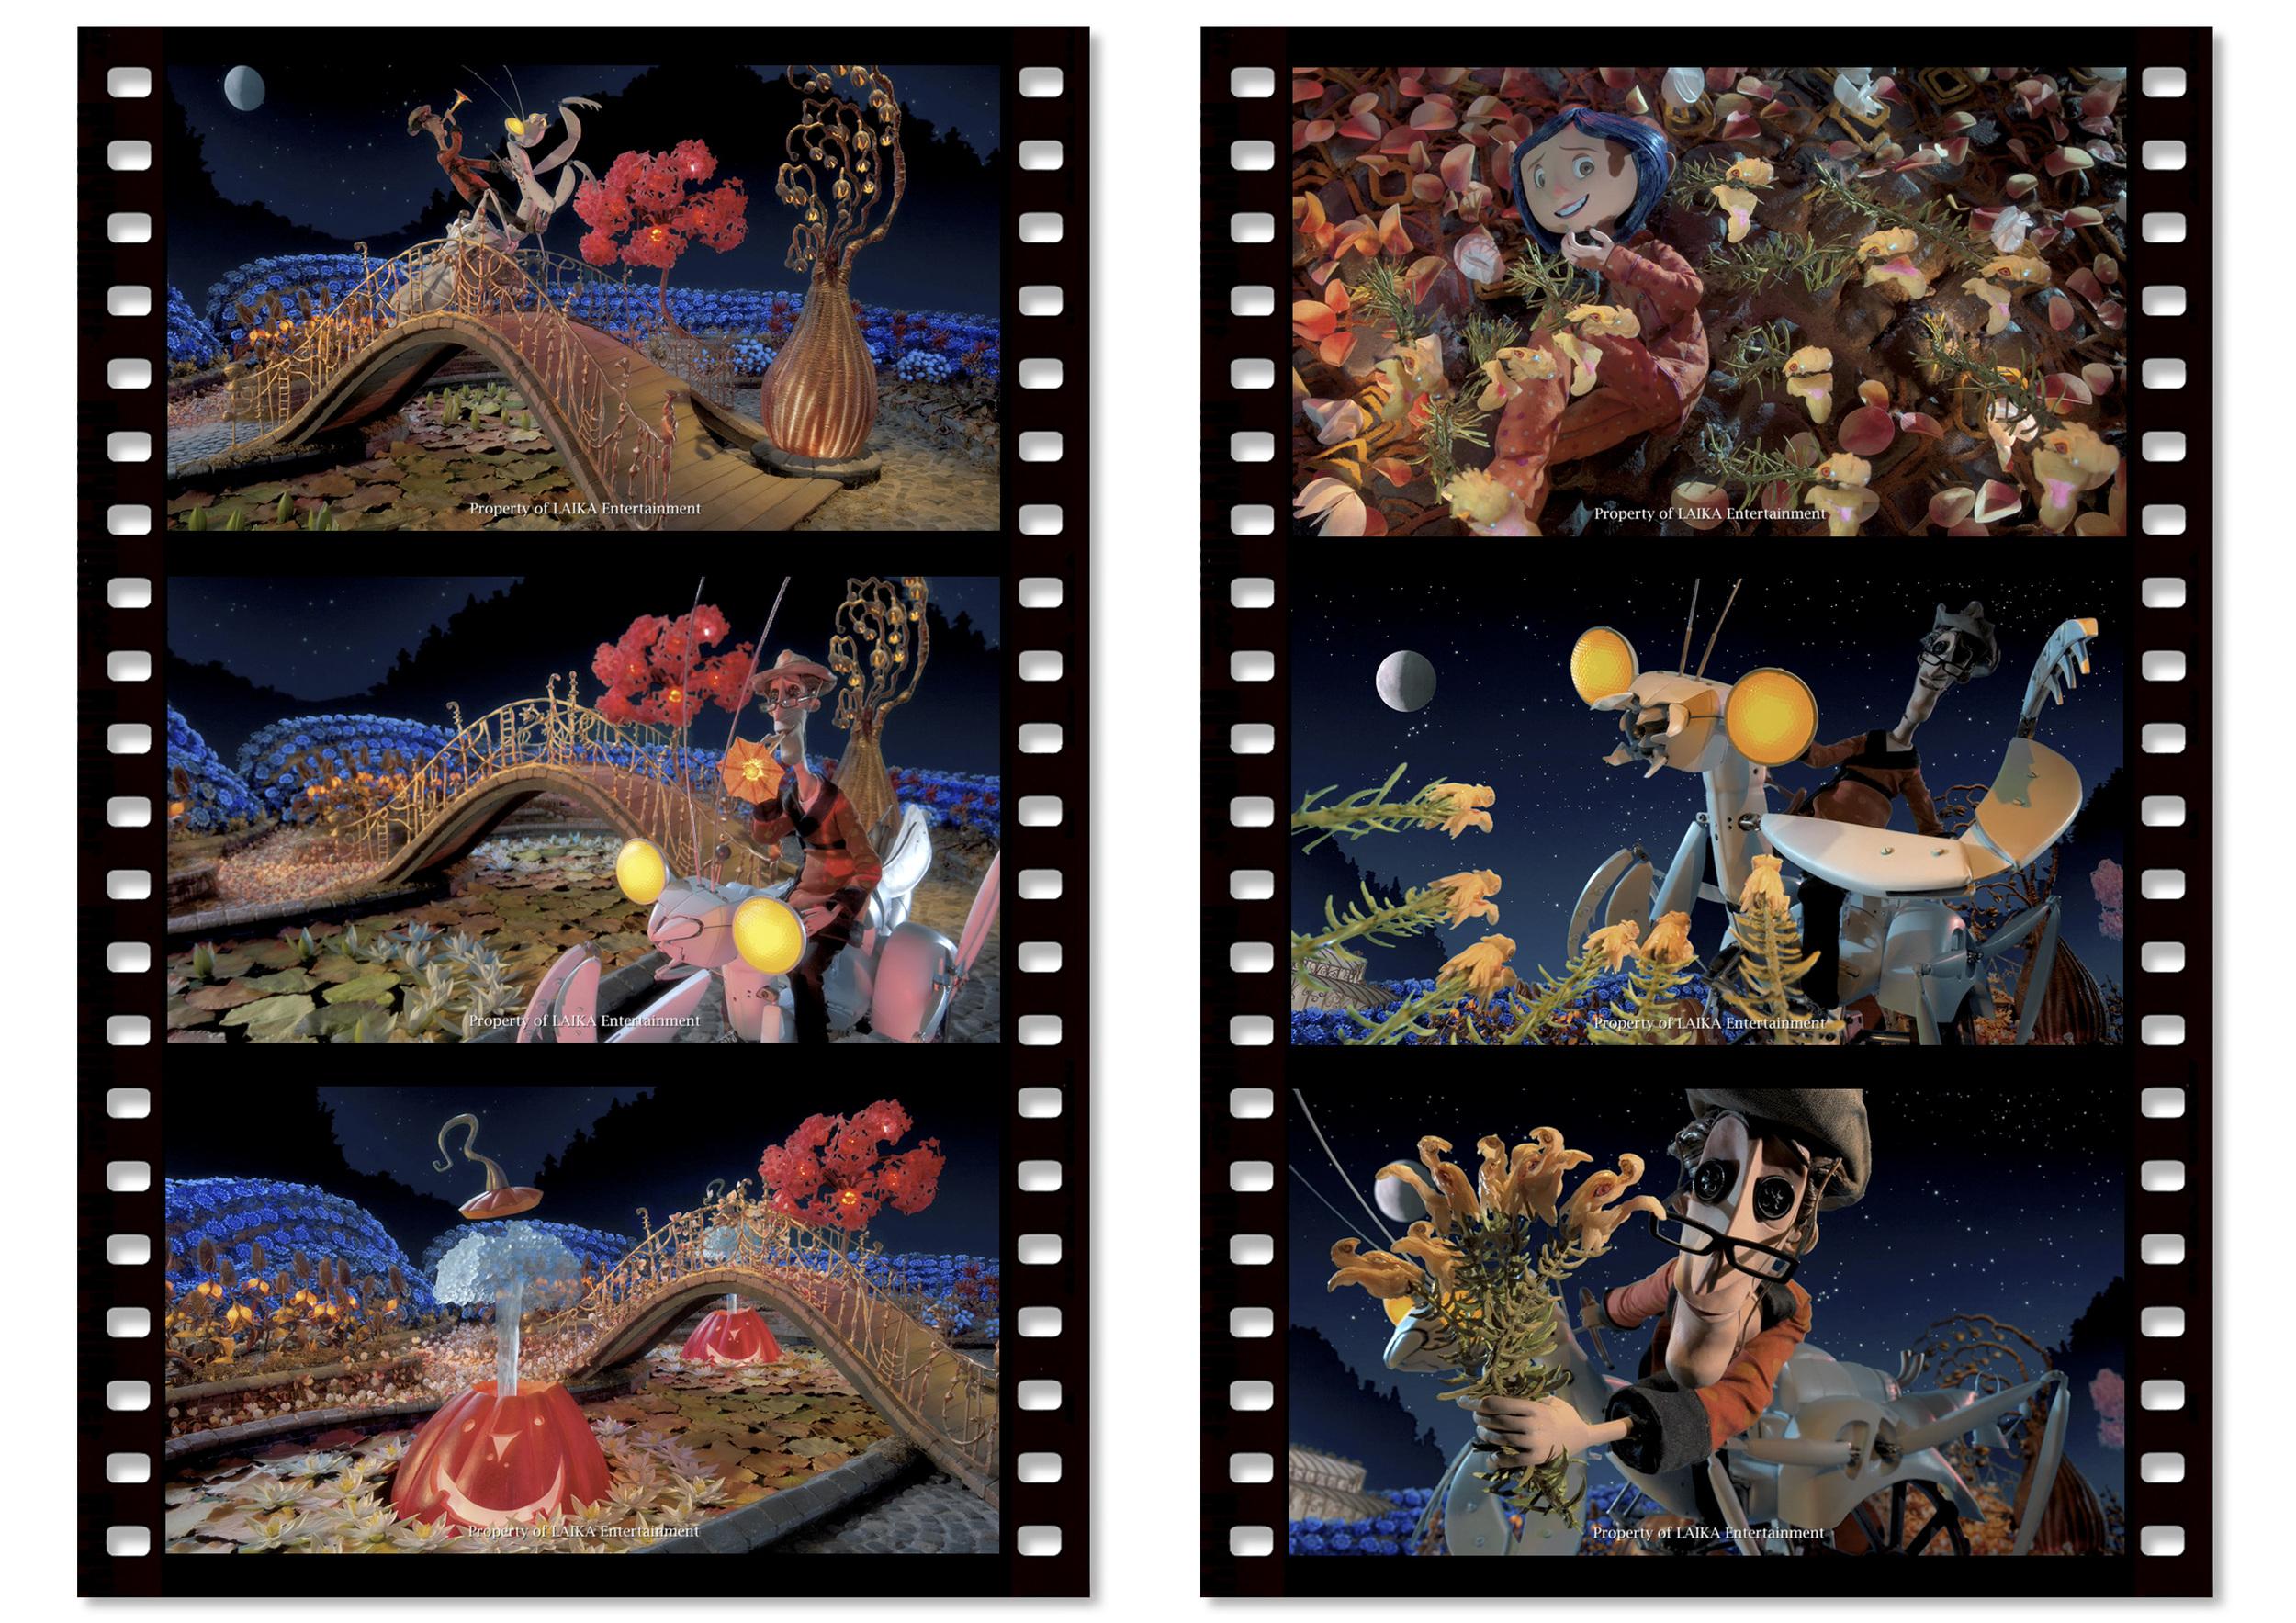 Coraline 6 images 5.jpg